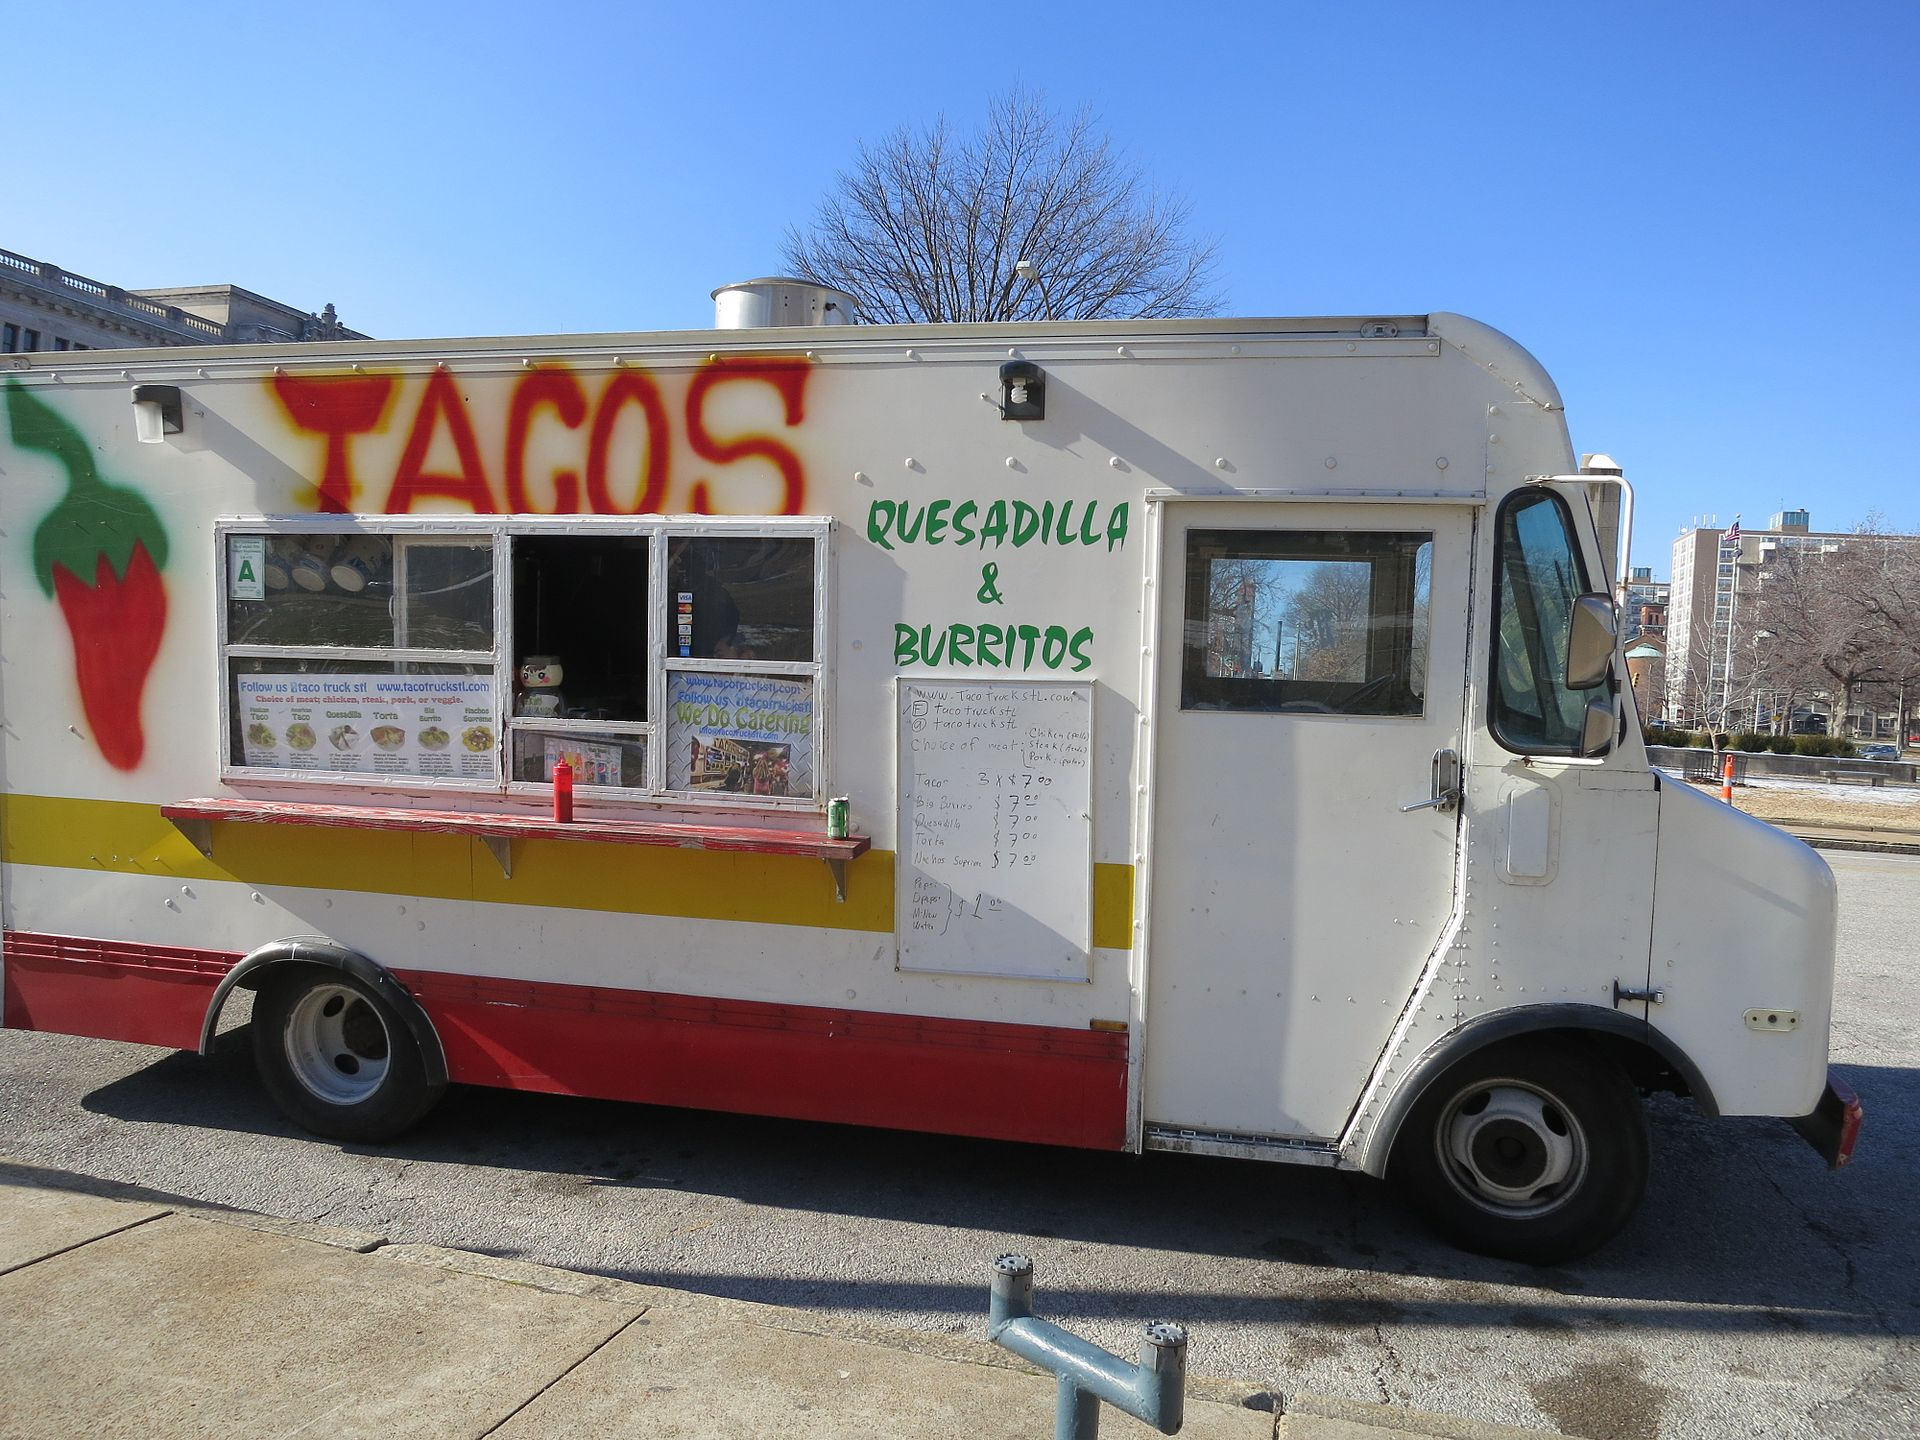 Taco truck - St. Louis, Missouri